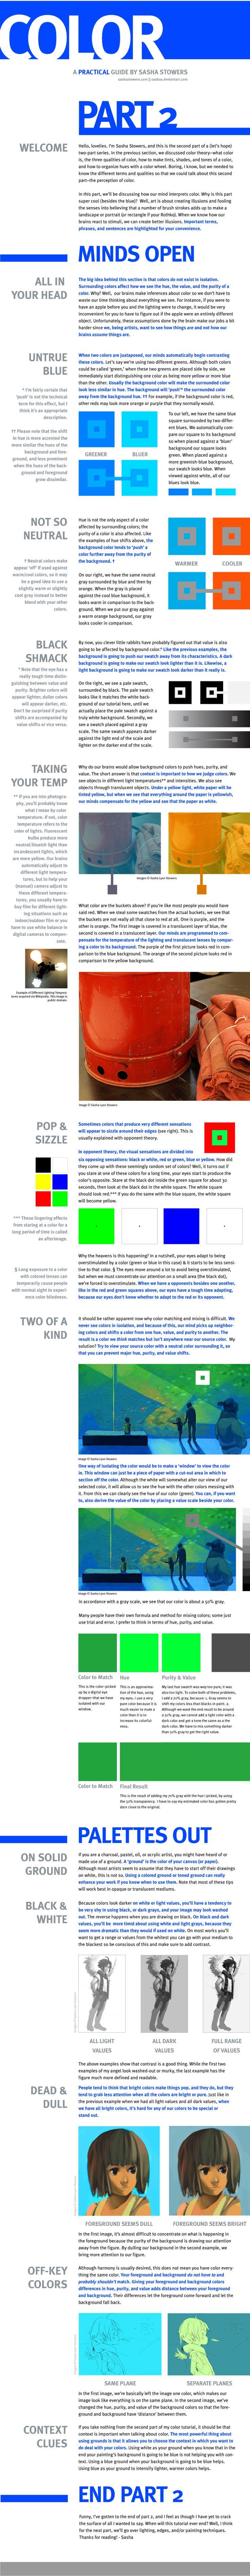 Colors art website - The Color Tutorial Part 2 By Sashas On Deviantart